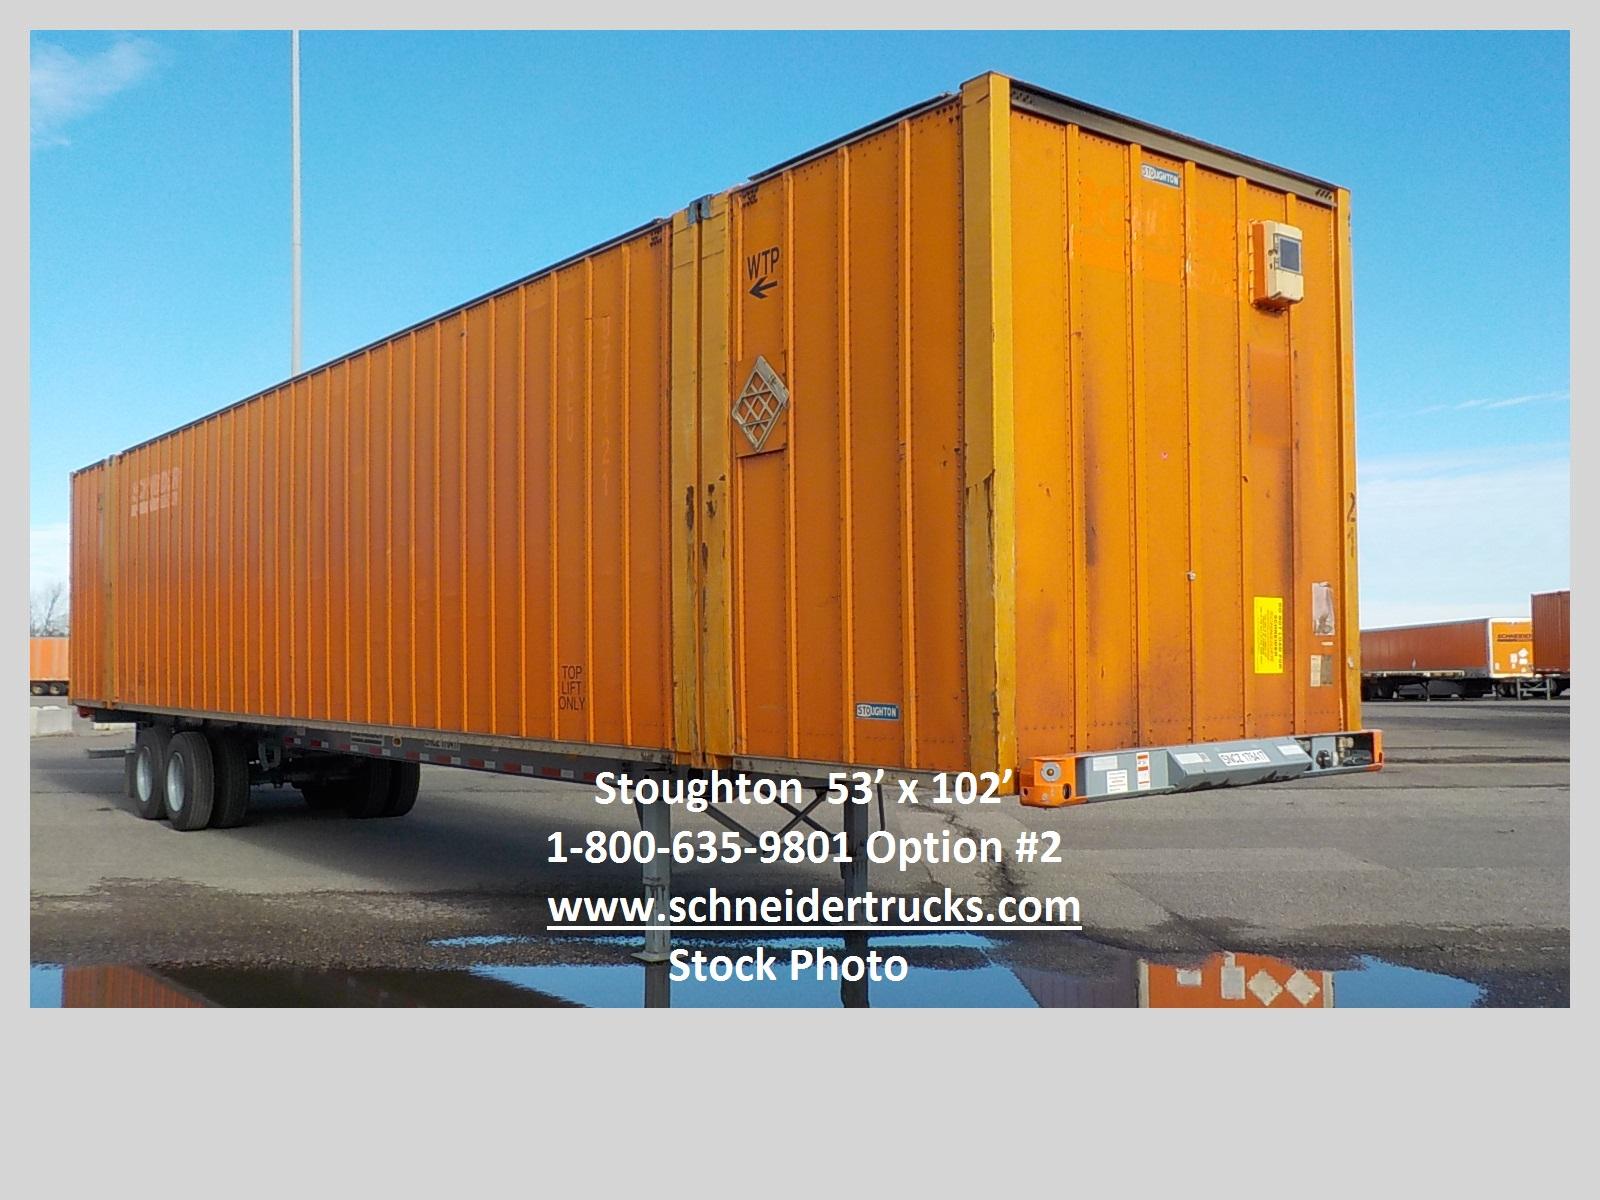 2006 Stoughton container